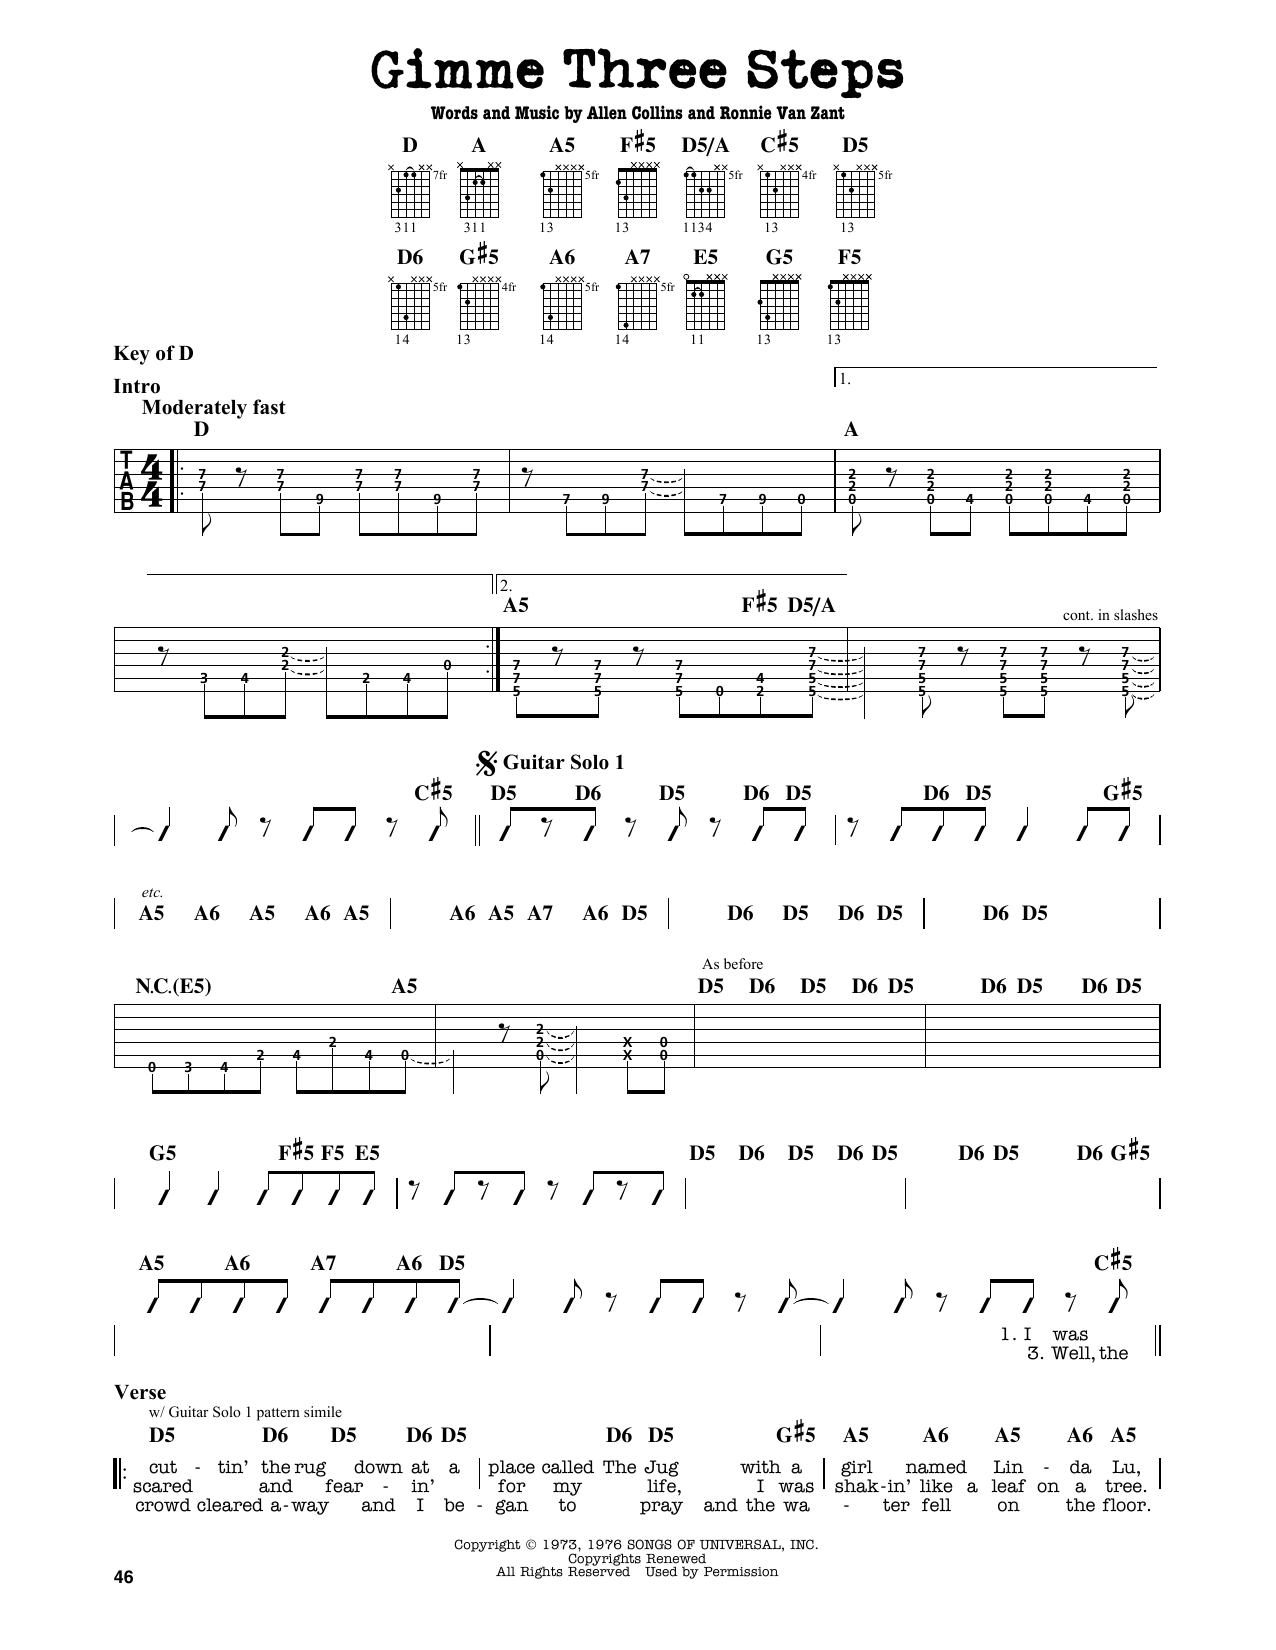 Lynyrd Skynyrd Gimme Three Steps Sheet Music Notes Chords